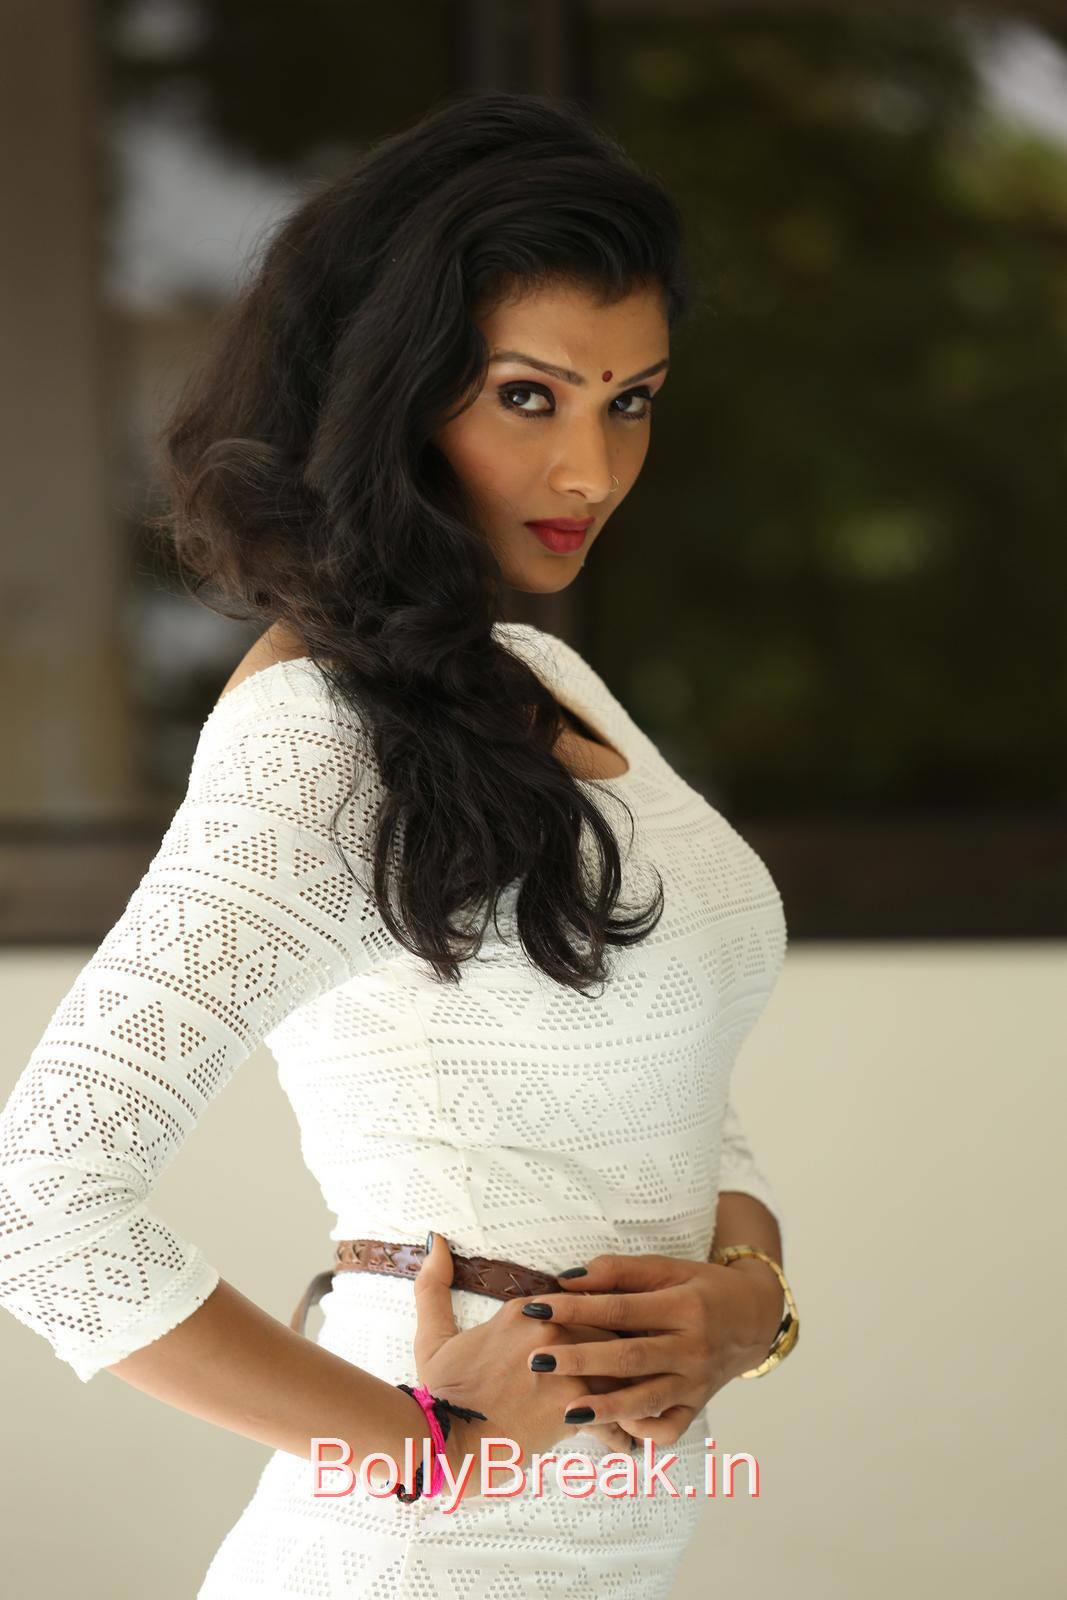 Ishita Pics, Actress Ishita Side Pose Hot Photo Gallery in HD